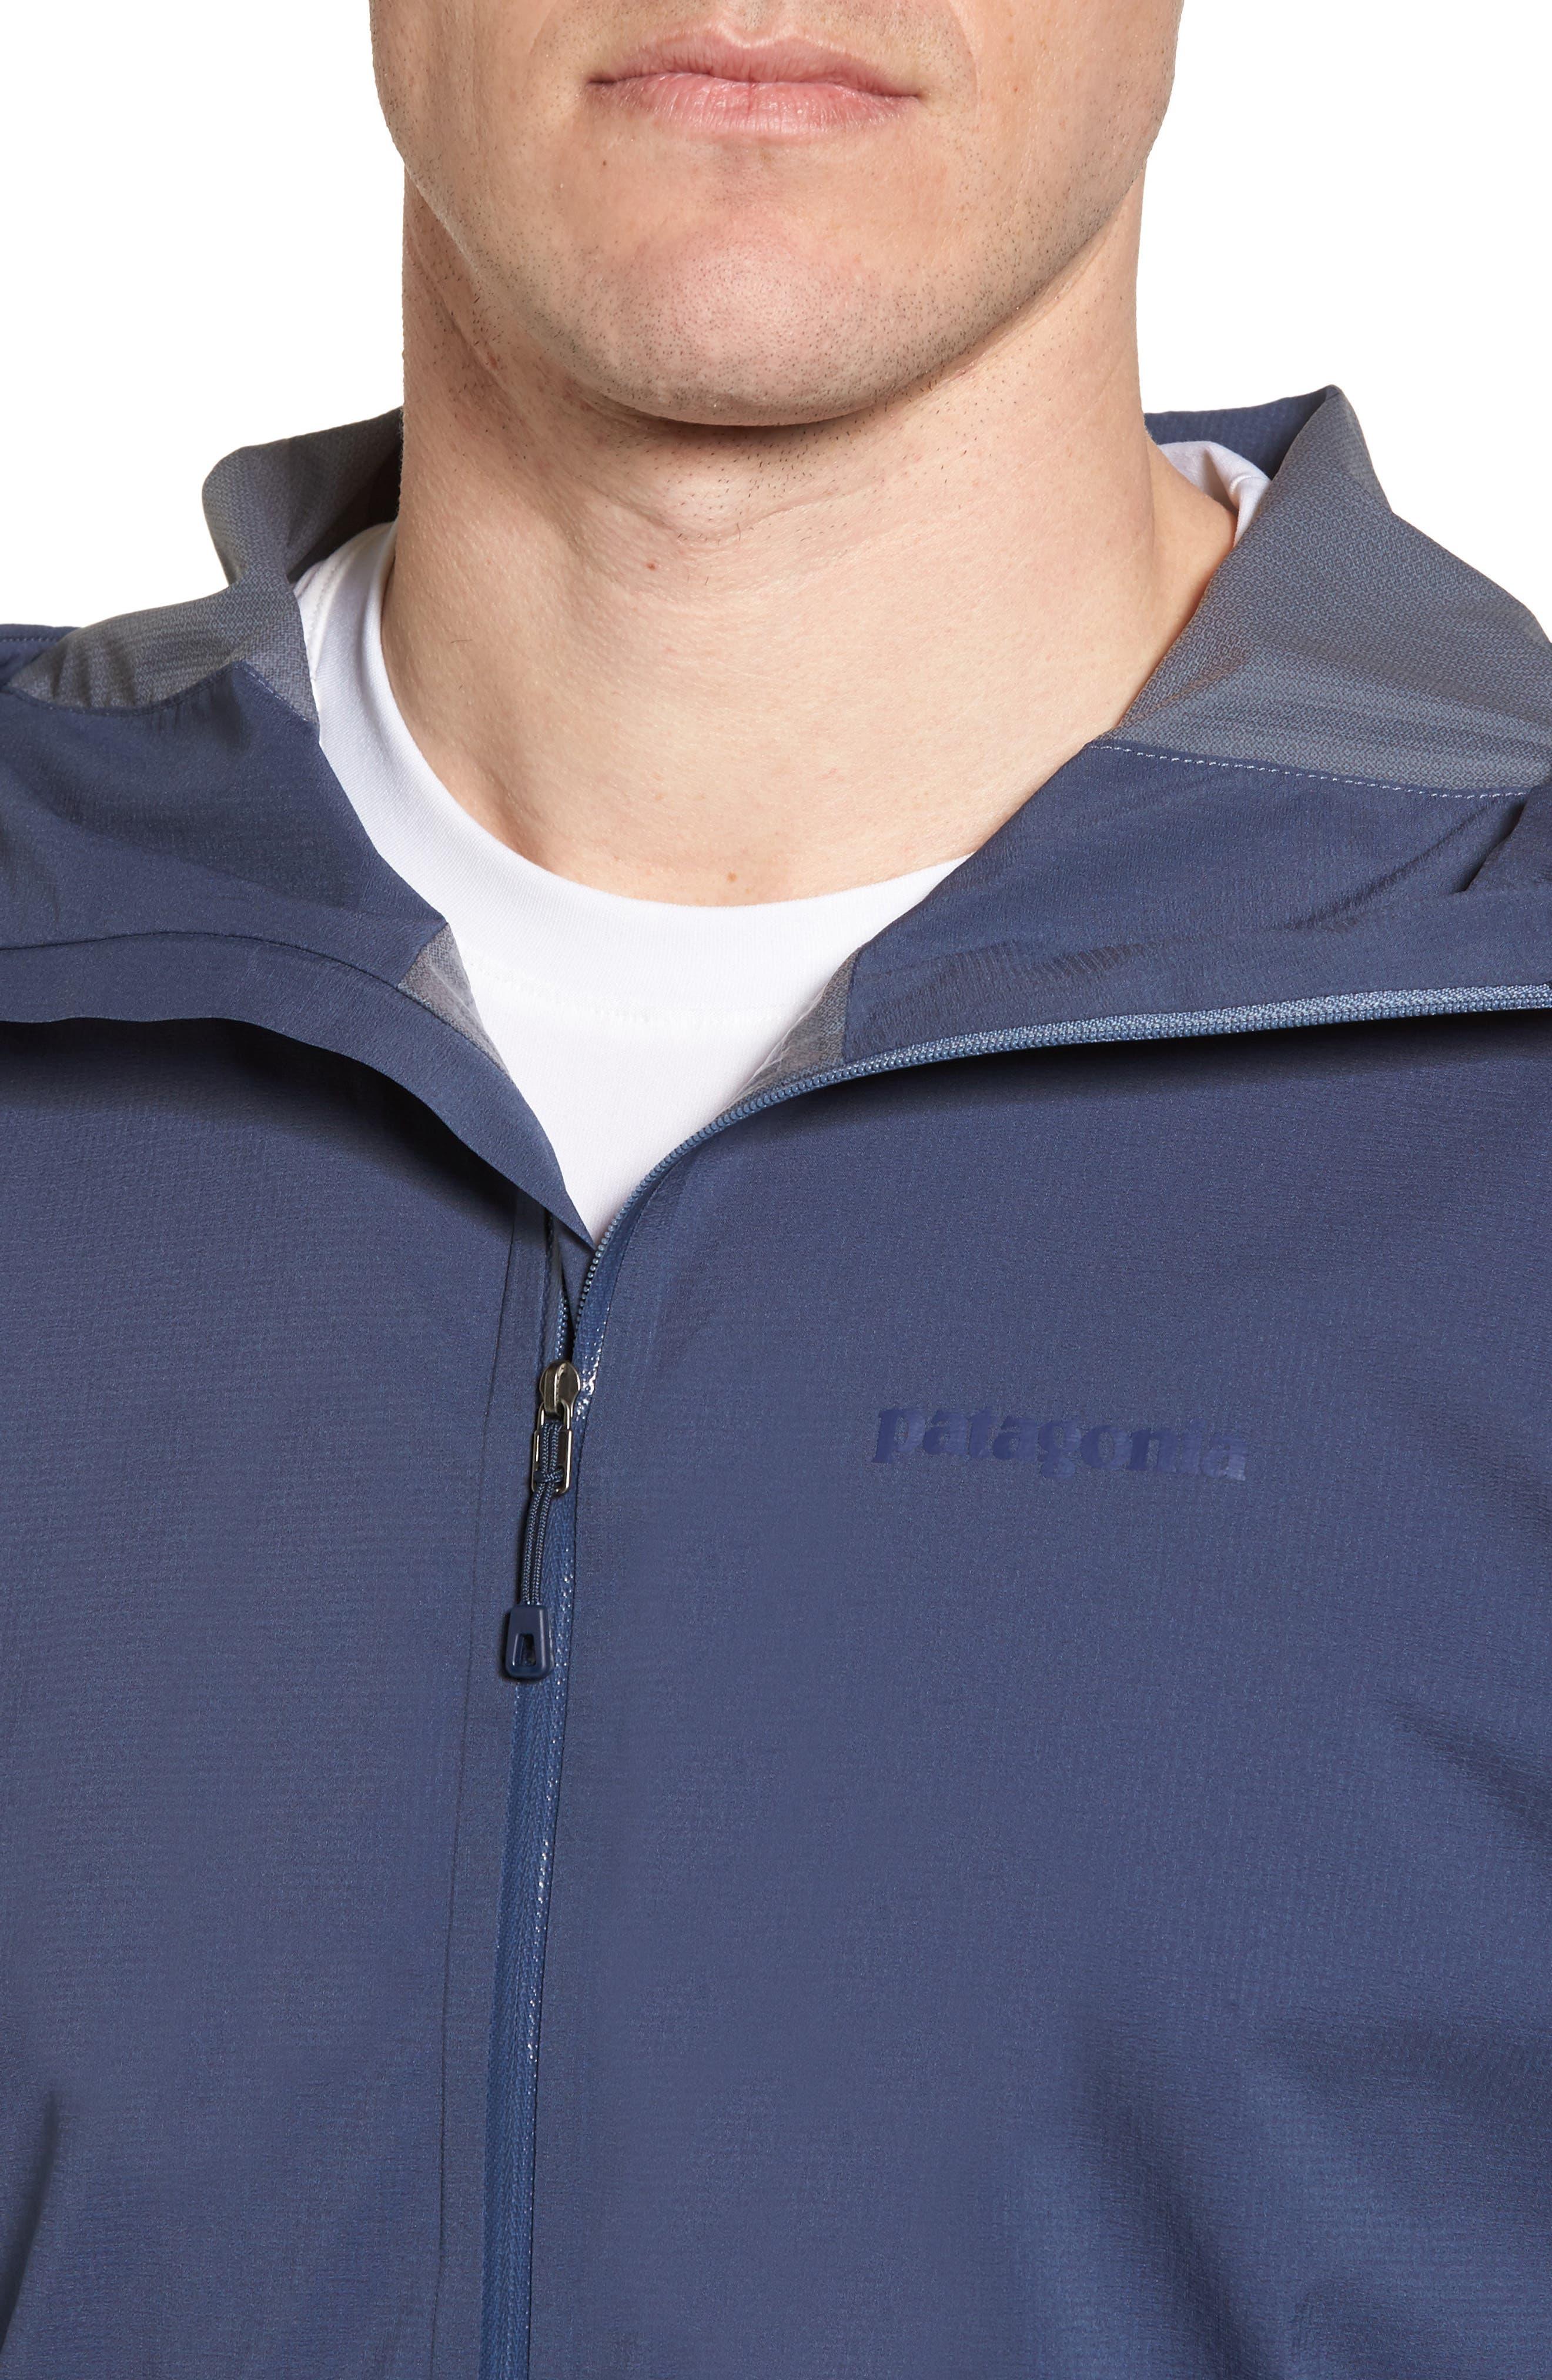 Stretch Rainshadow Jacket,                             Alternate thumbnail 4, color,                             Dolomite Blue